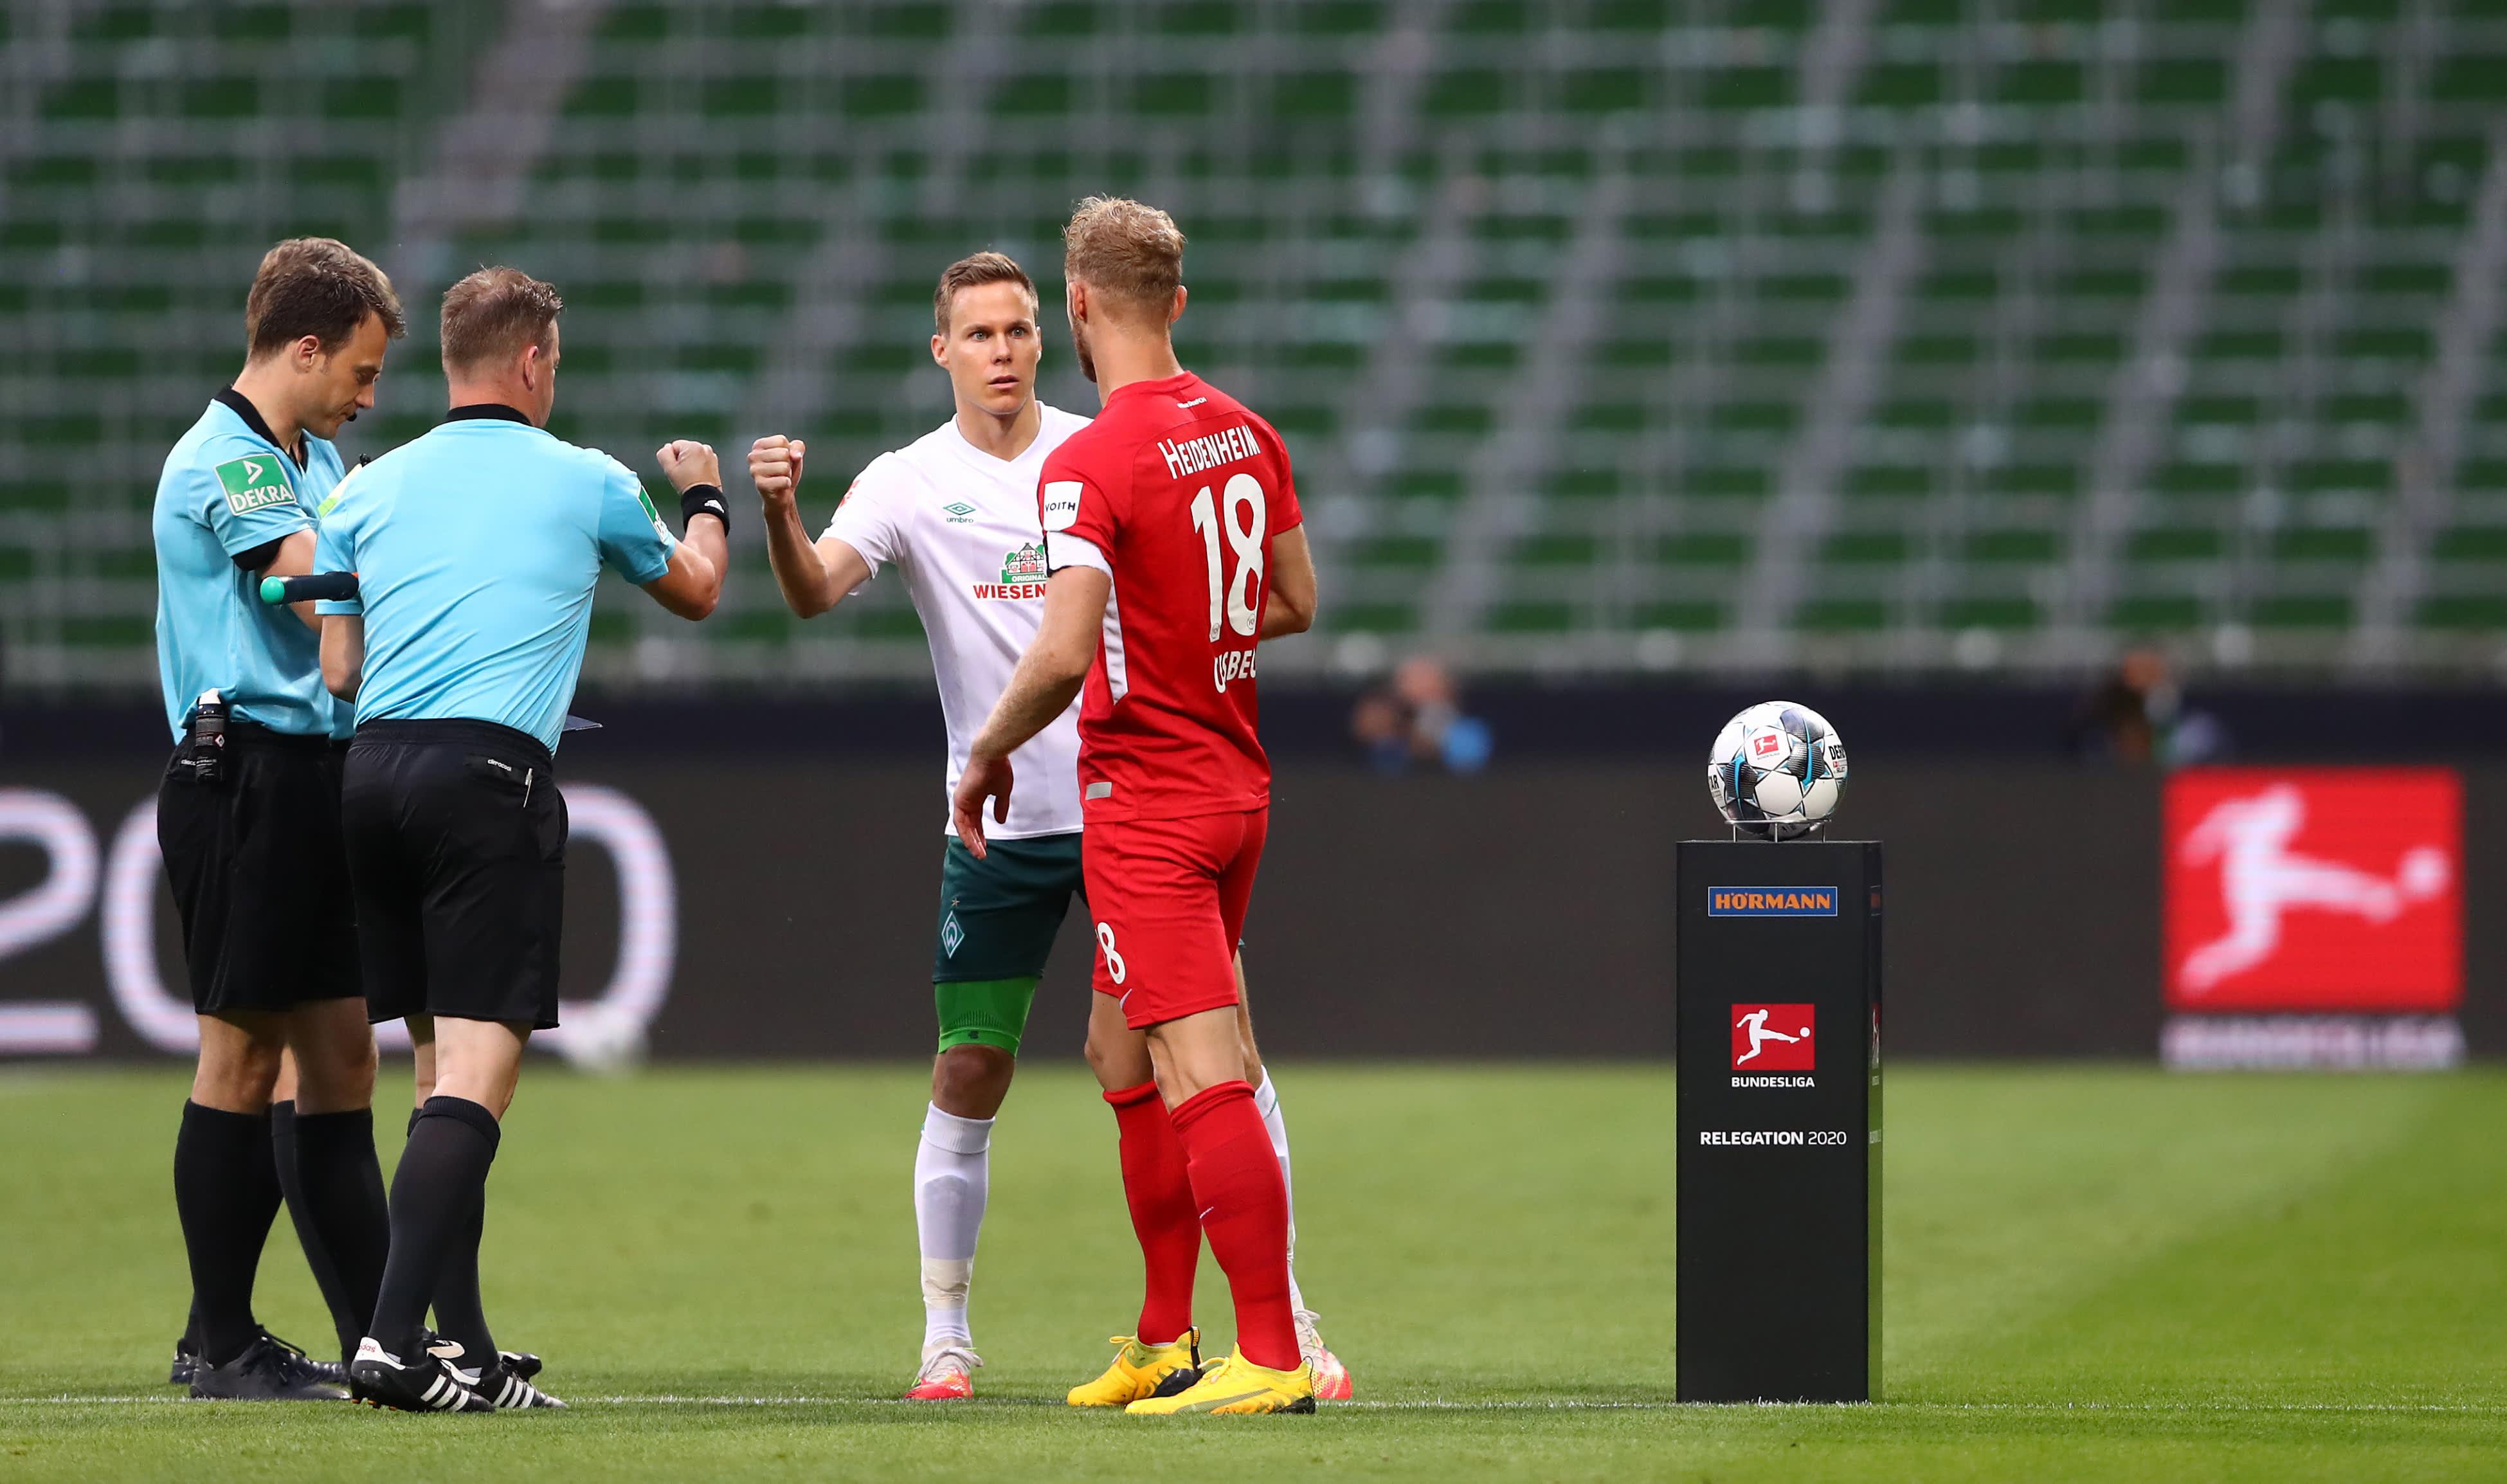 Bremenin kapteeni Niklas Moisander tervehtii Heidenheimin kipparia Sebastian Griesbeckia.